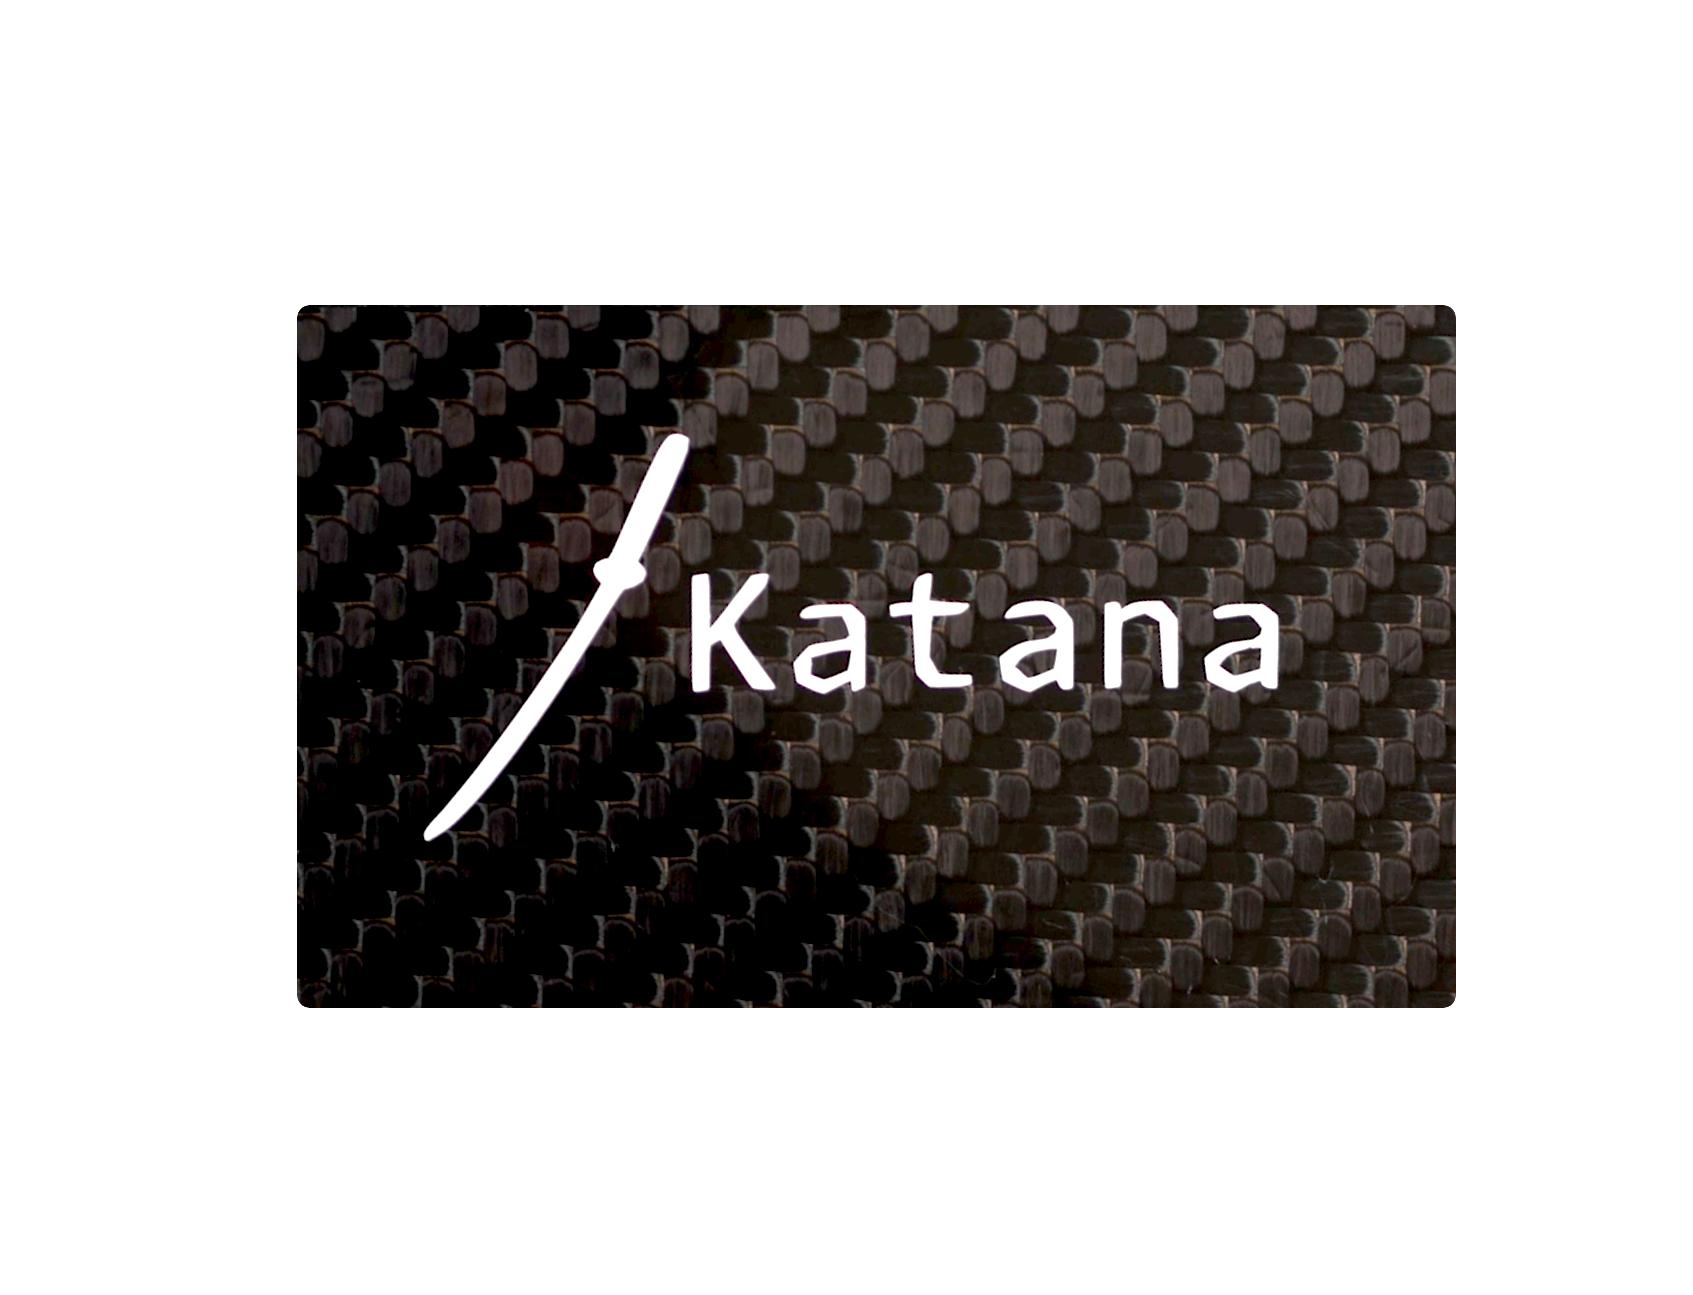 Katana_Main_Image.png